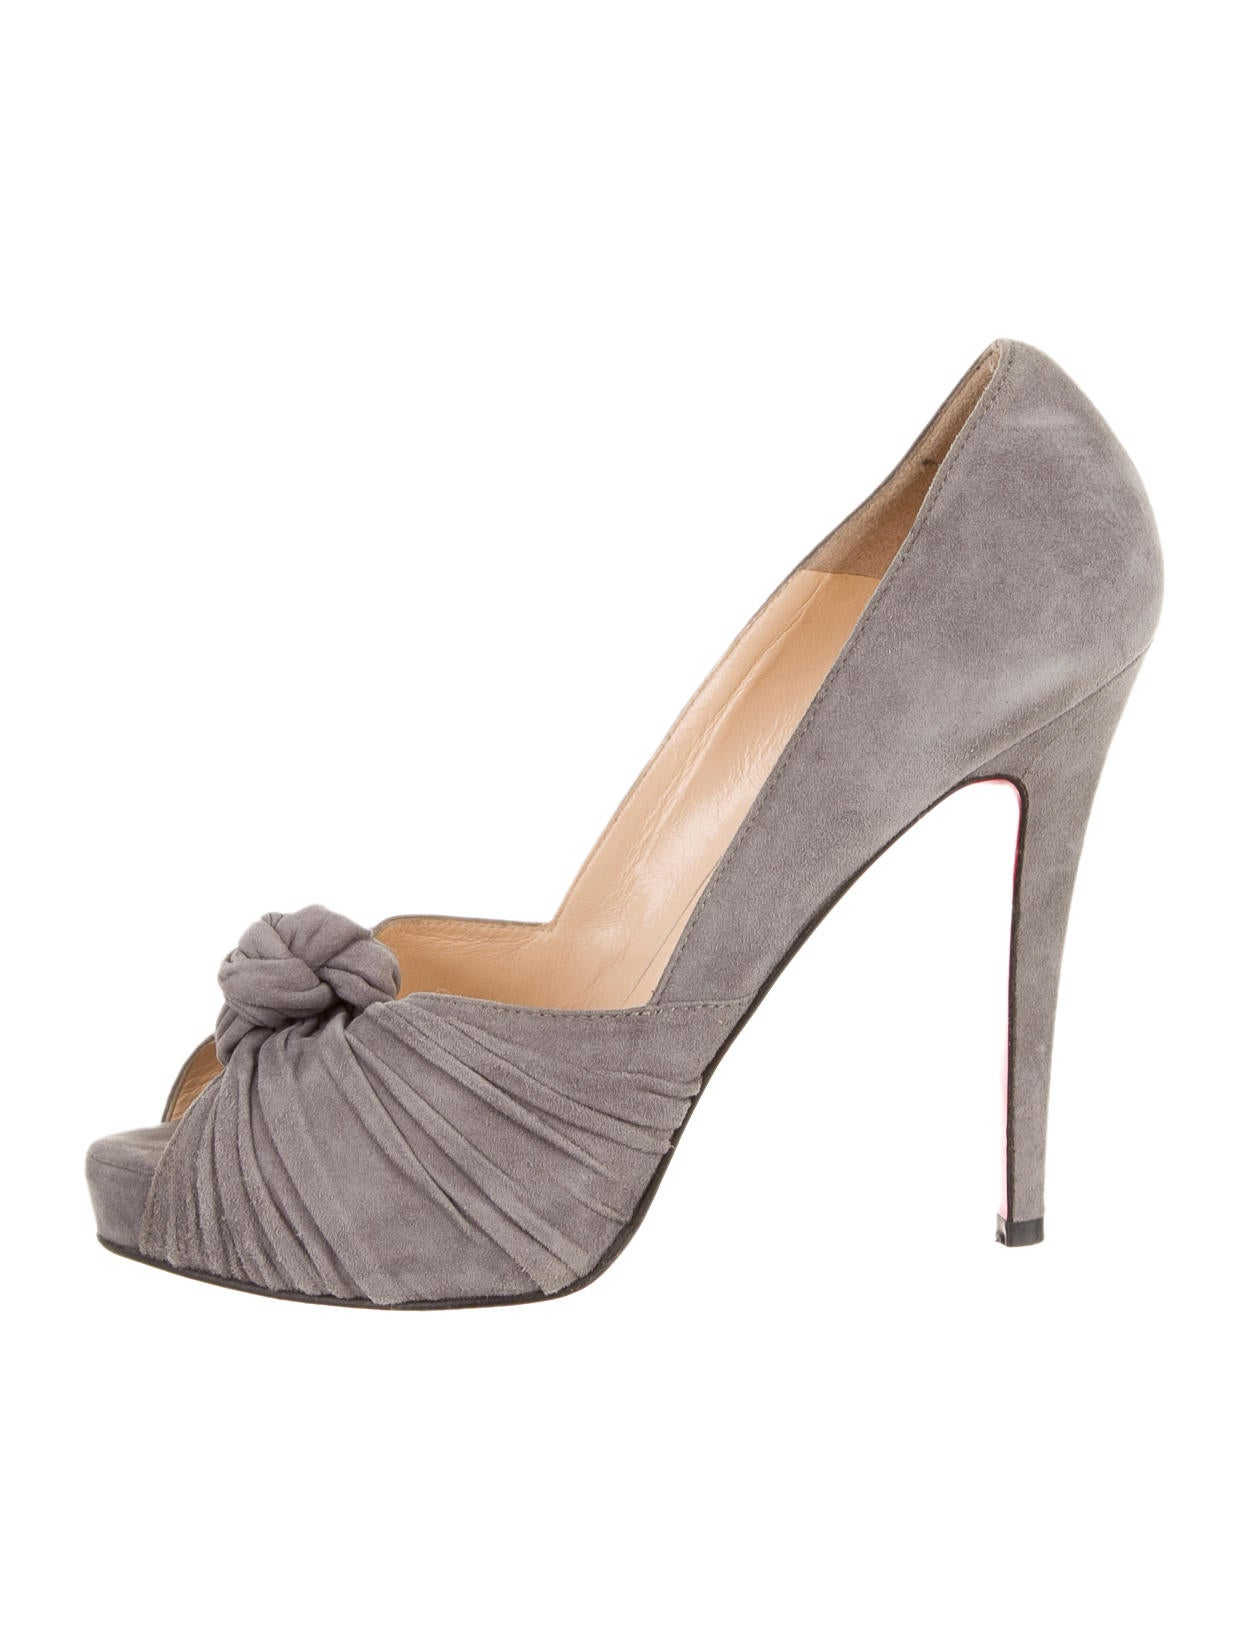 18ef71ffde8 Artesur » christian louboutin peep-toe pumps Grey suede gathers